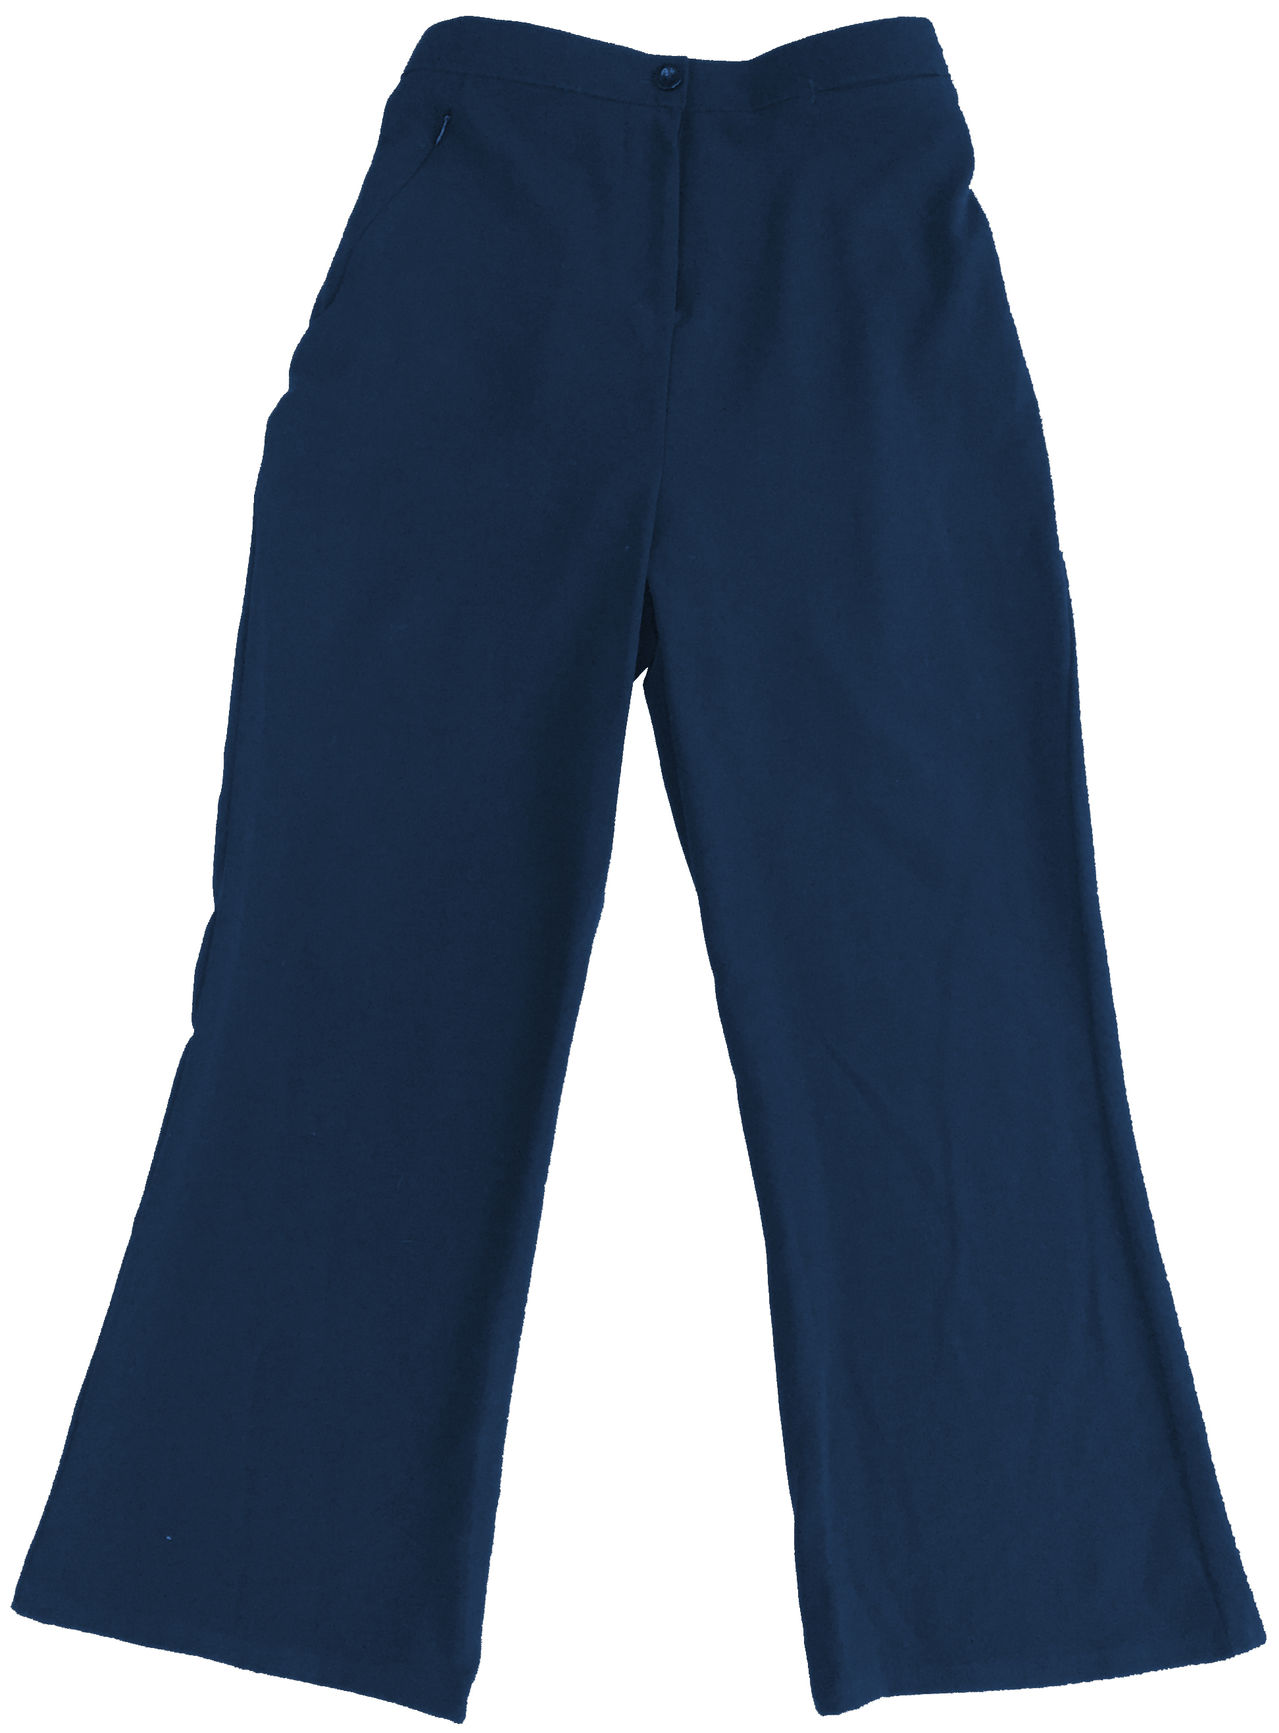 Sturdy Fit Girls//Ladies School Uniform Trouser Only Uniform® UK